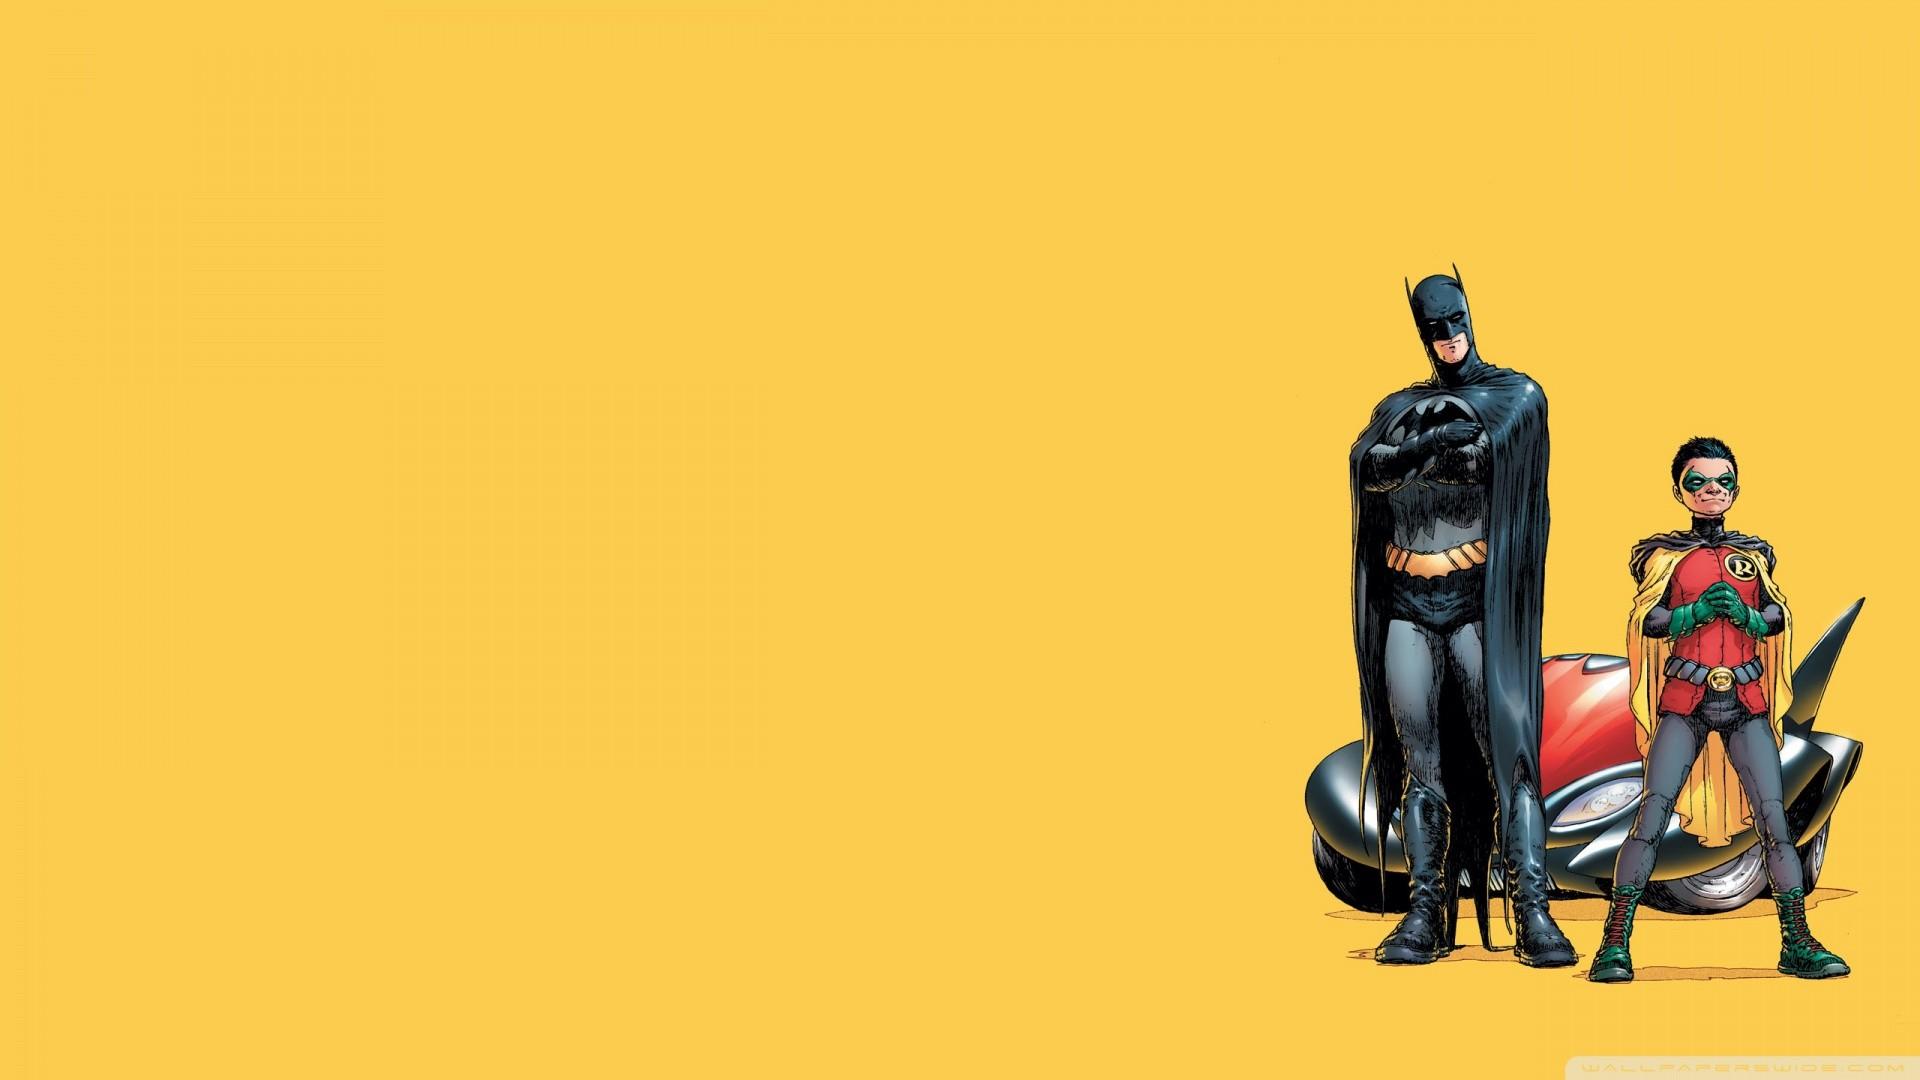 Batman And Robin Cartoon Wallpaper Batman, And, Robin .